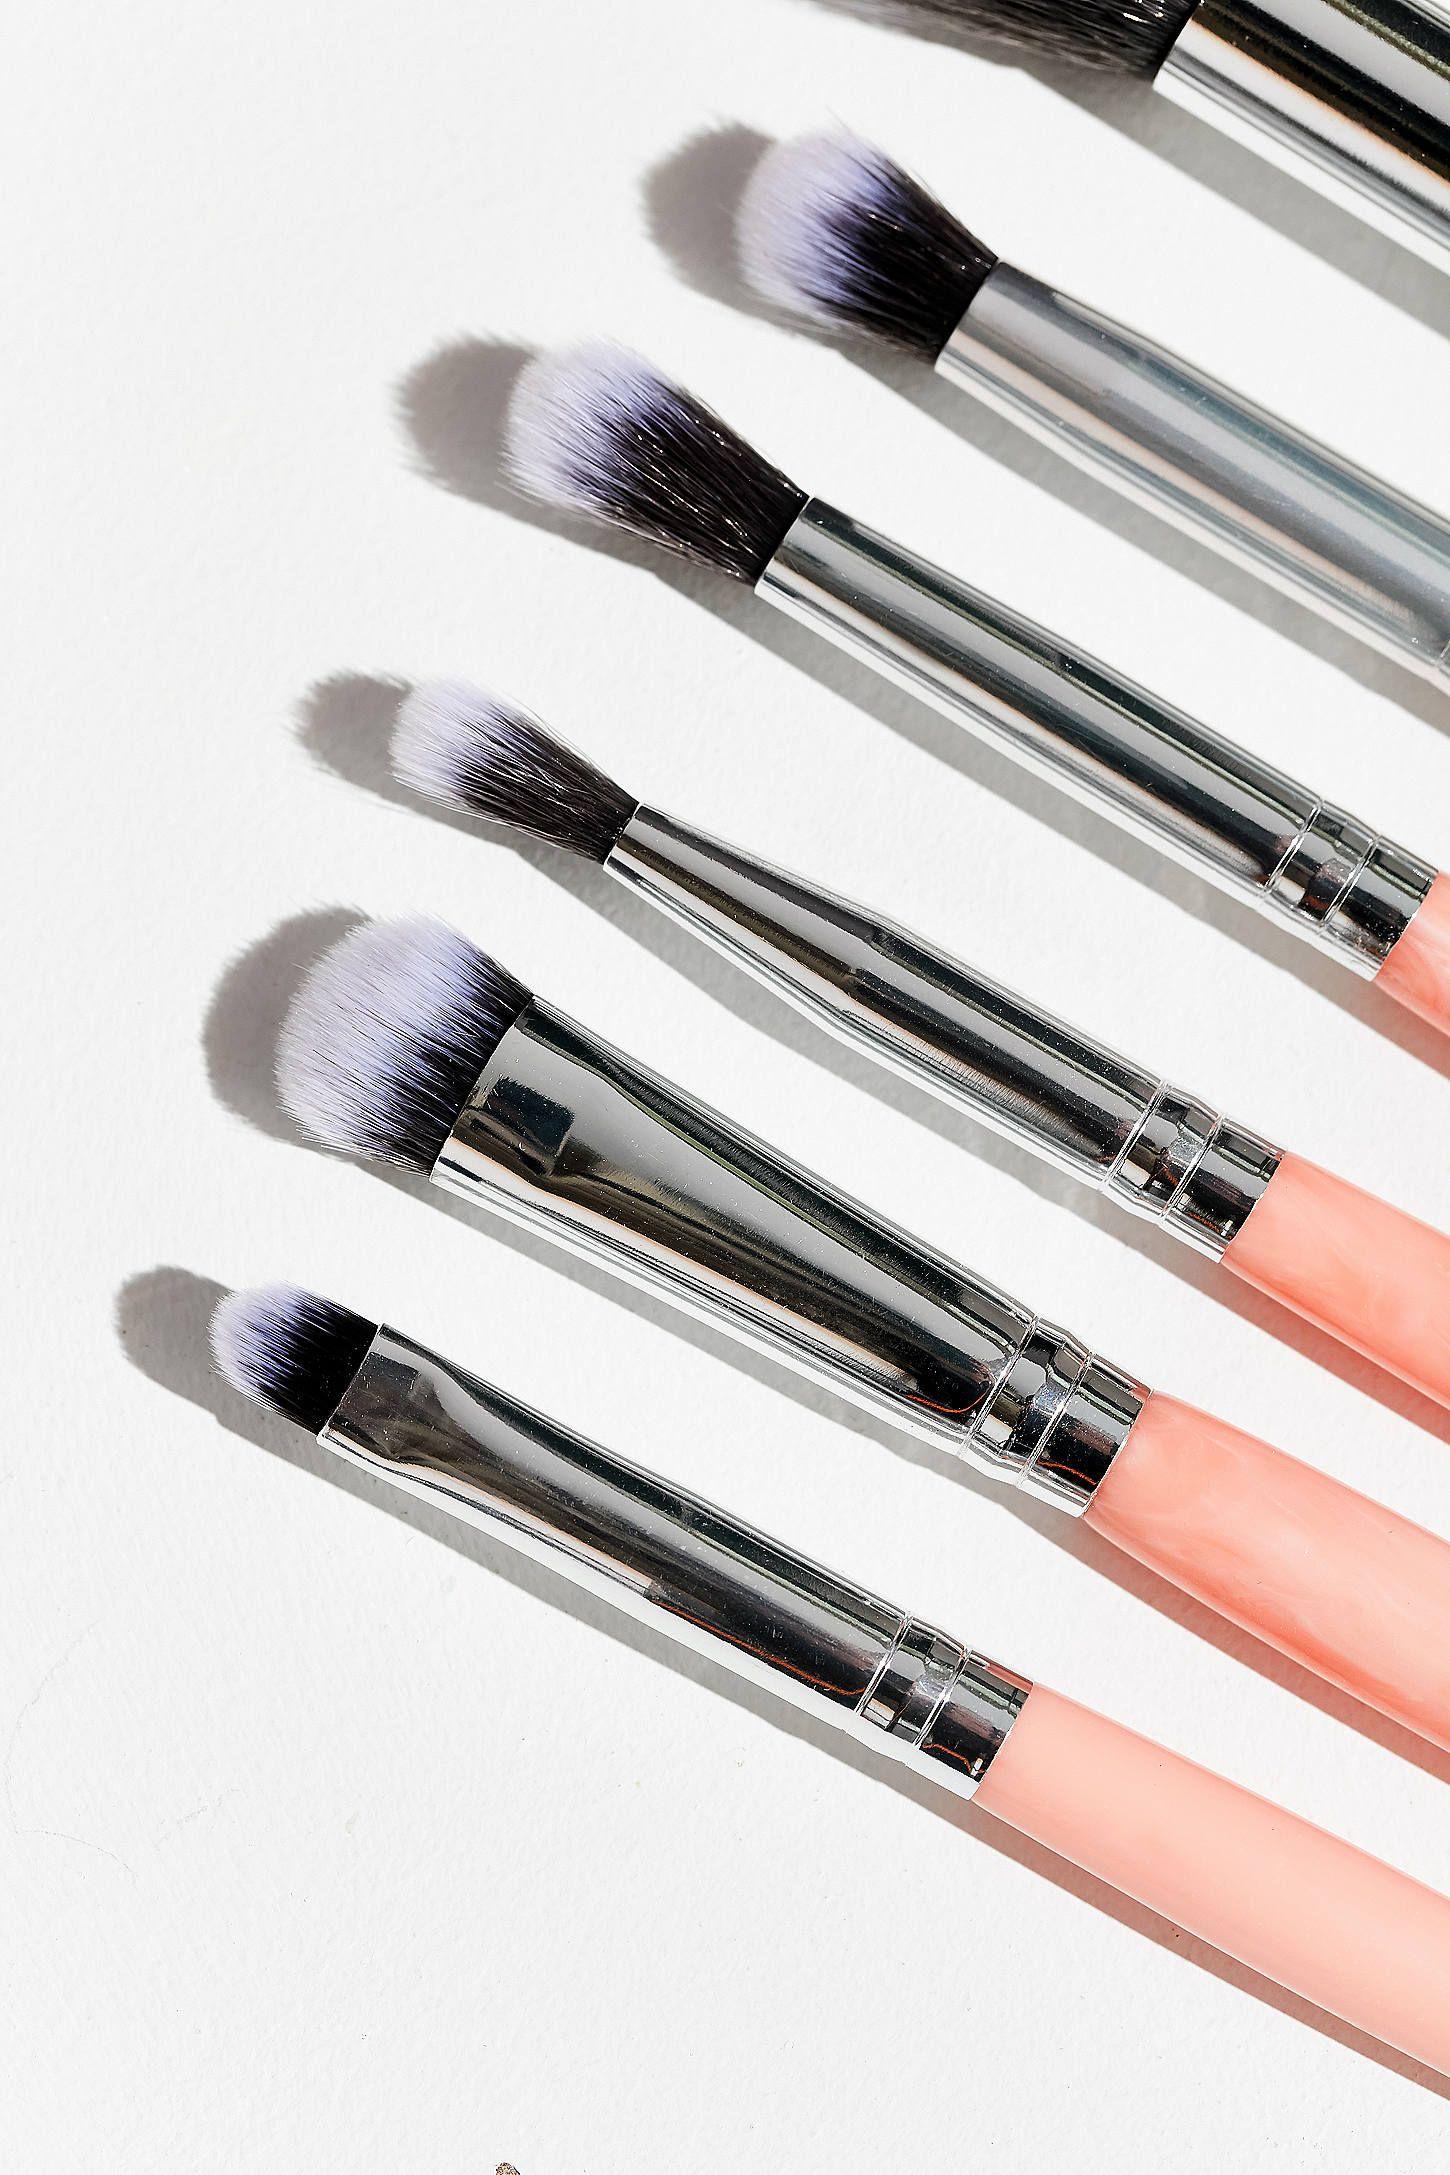 bh cosmetics Rose Quartz 9Piece Brush Set Best cheap